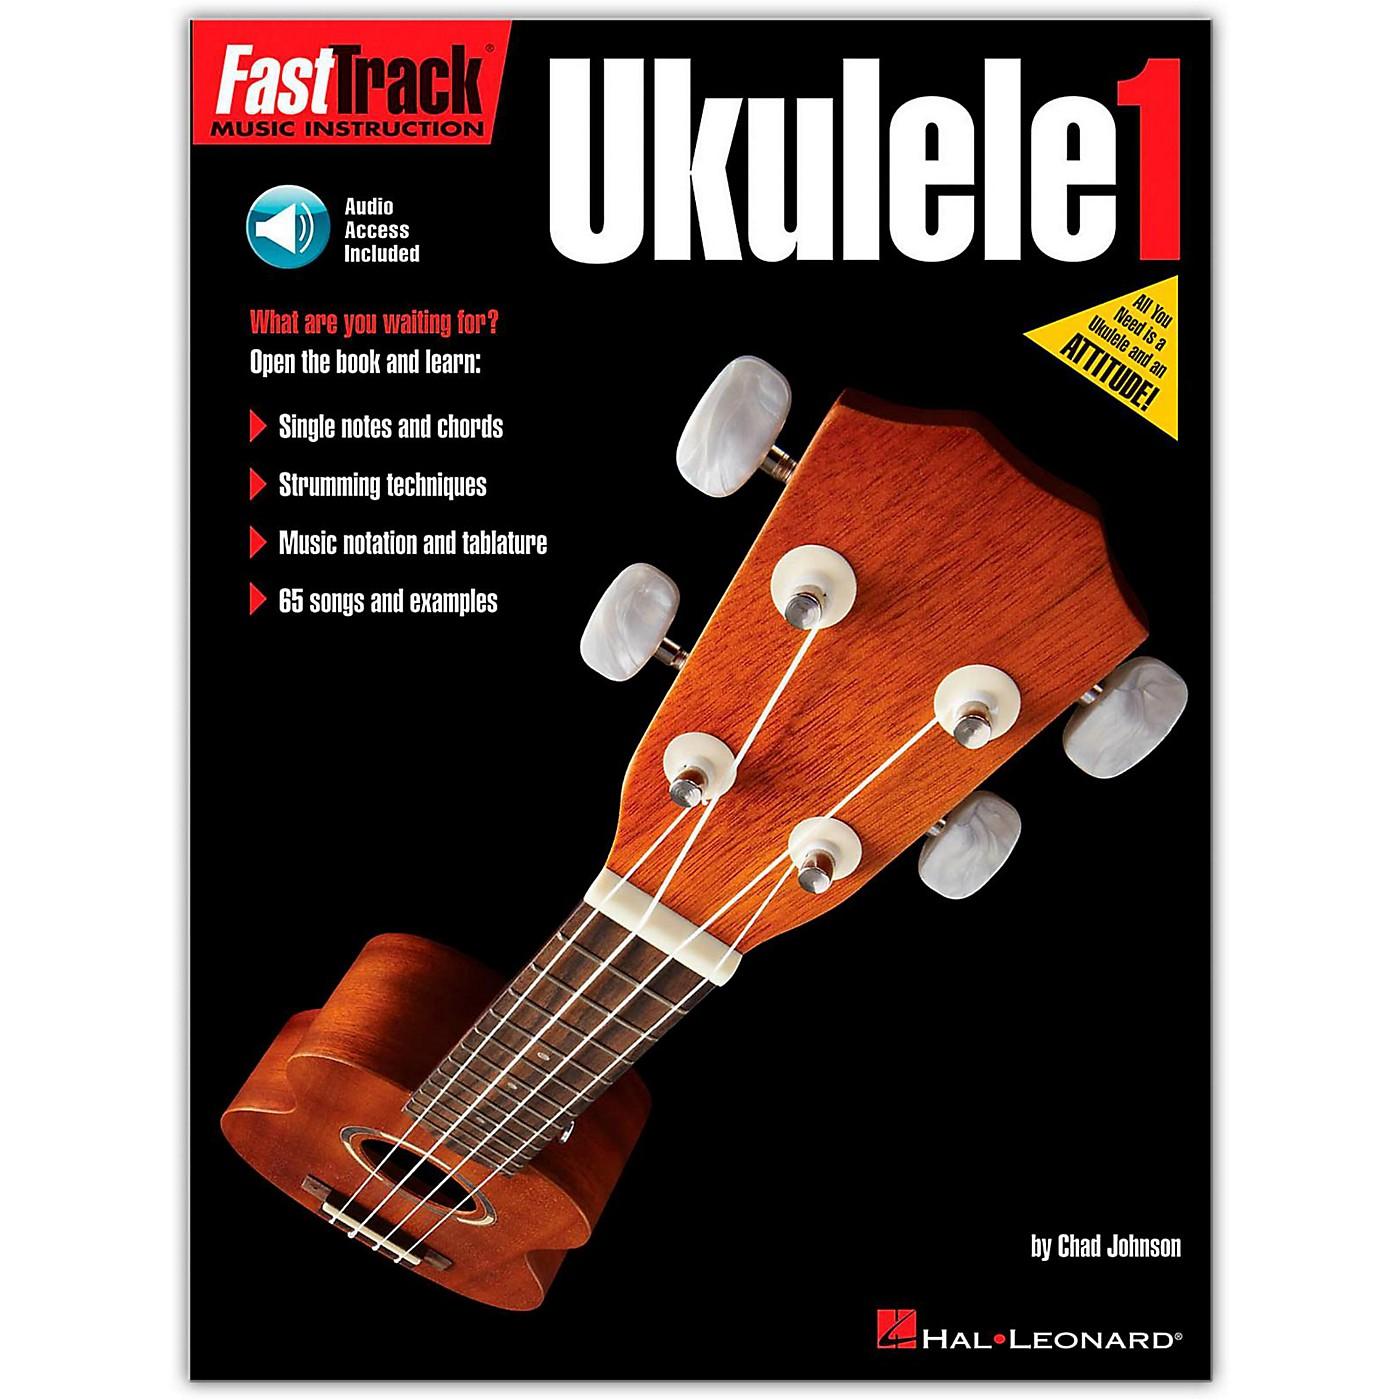 Hal Leonard FastTrack Ukulele Method Book 1 (Book/Online Audio) thumbnail